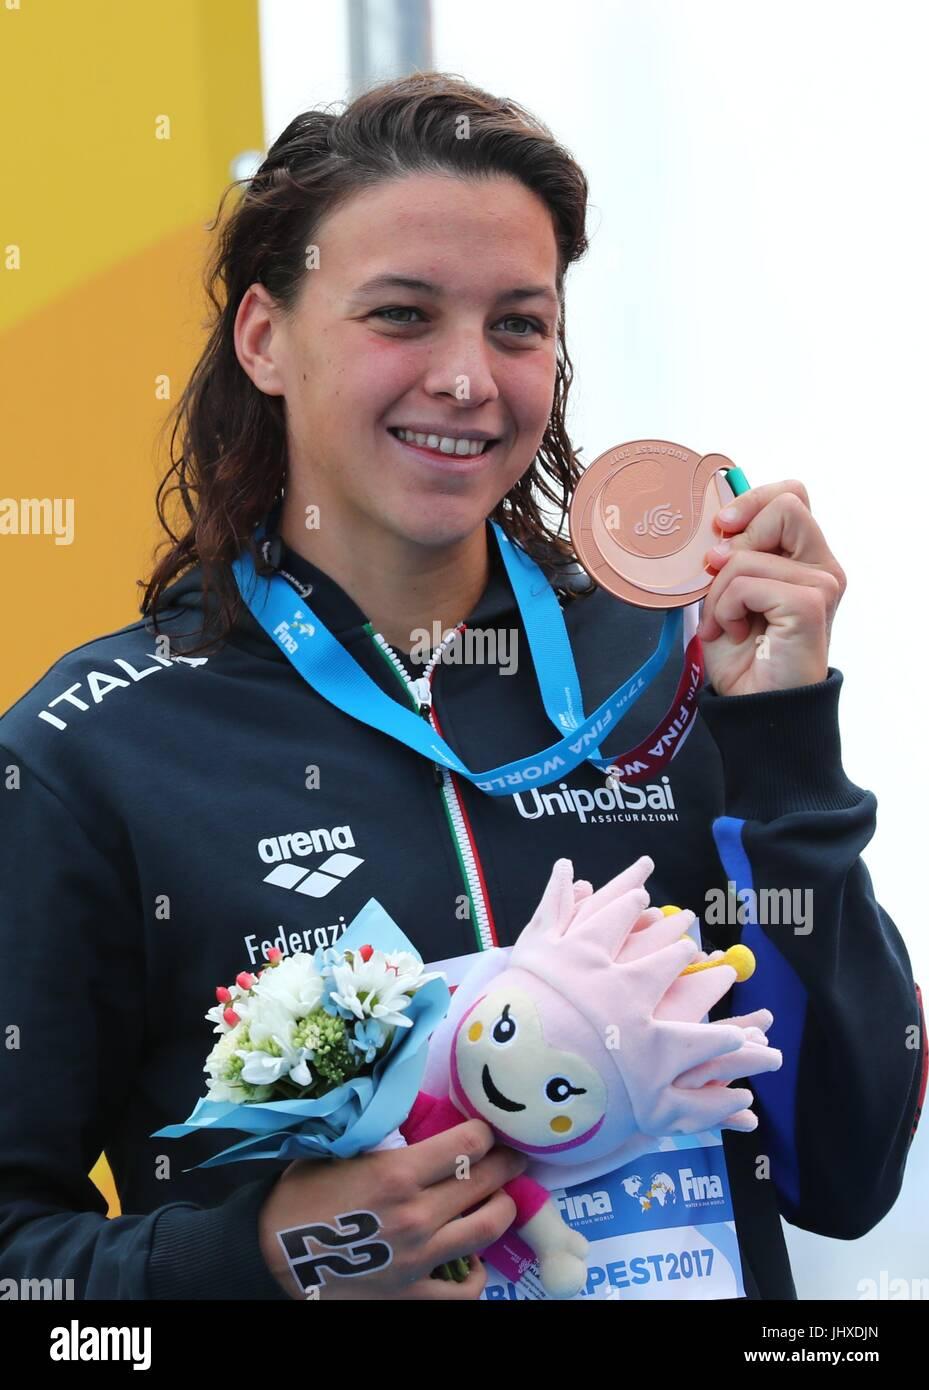 Balatonfured Hungary 16th July 2017 Bronze Medalist Arianna Bridi Of Italy Poses